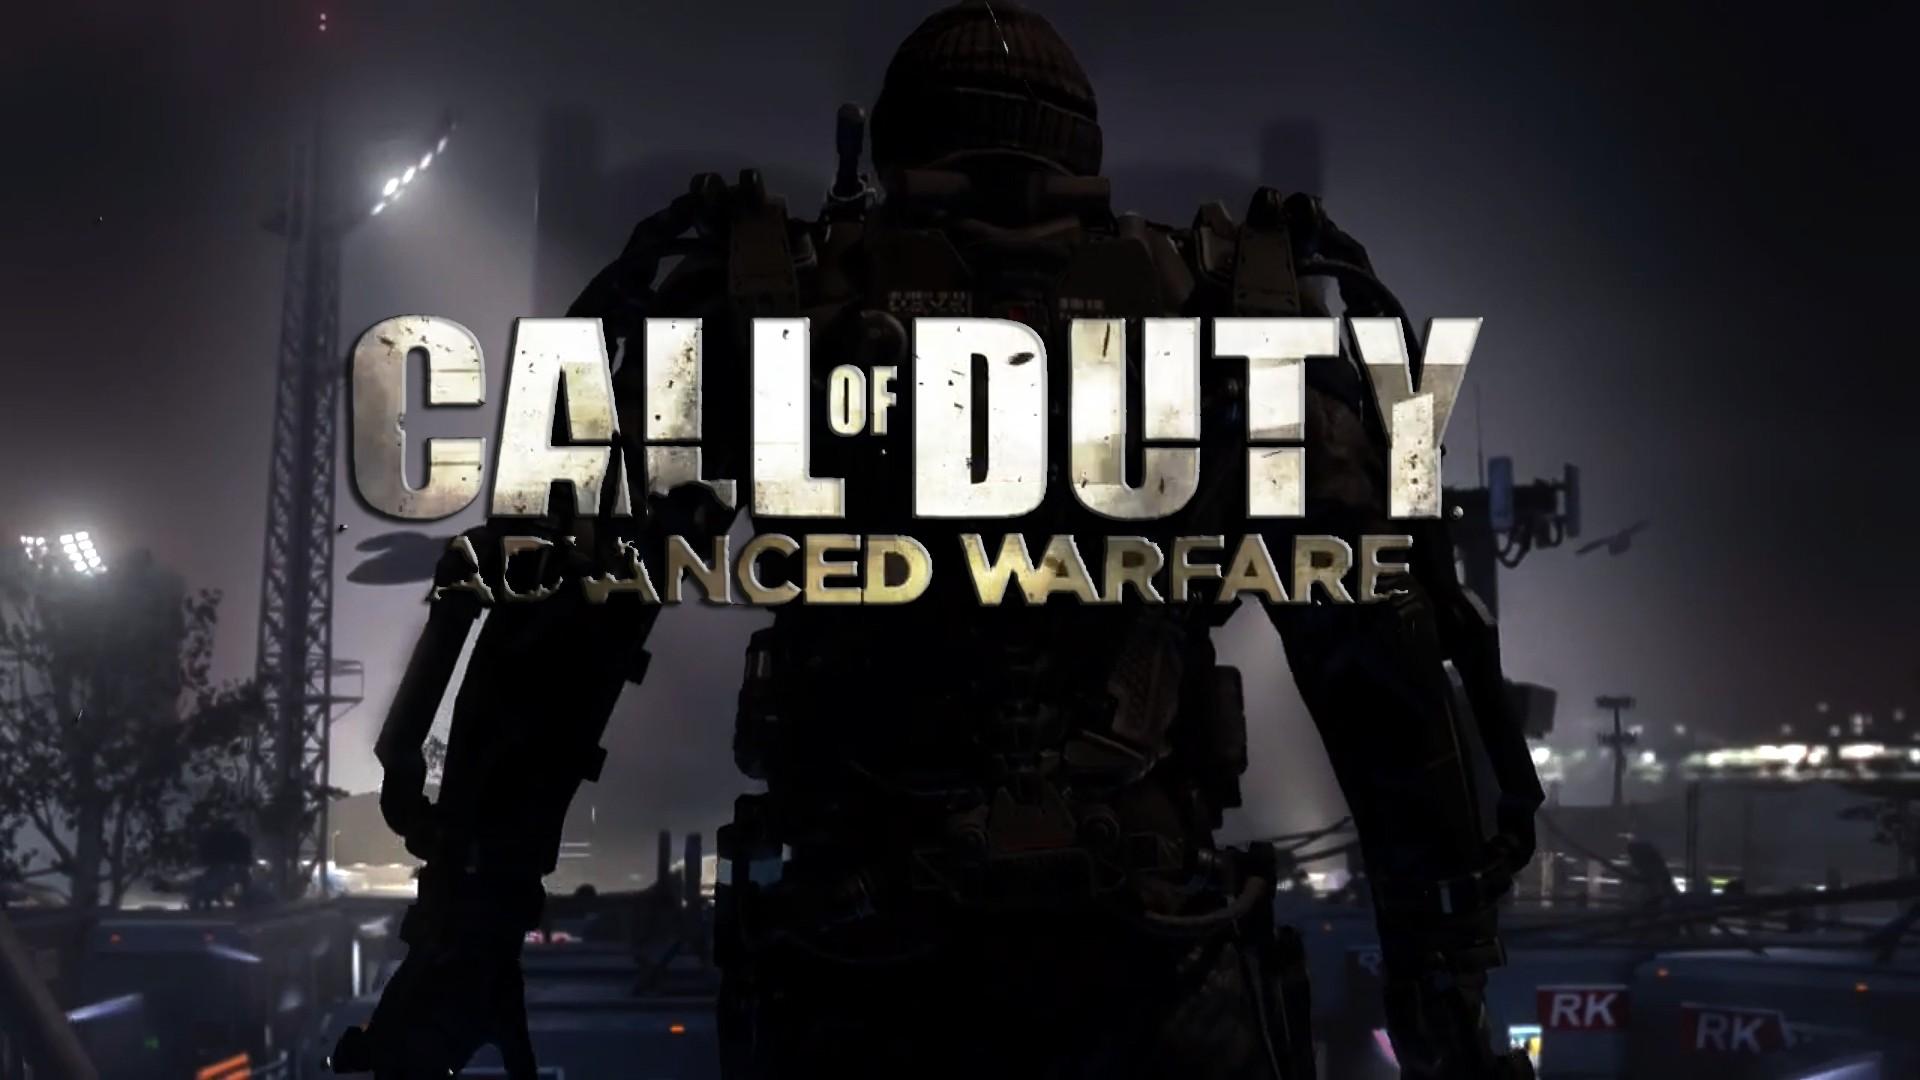 Call of Duty Advanced Warfare wallpaper 13